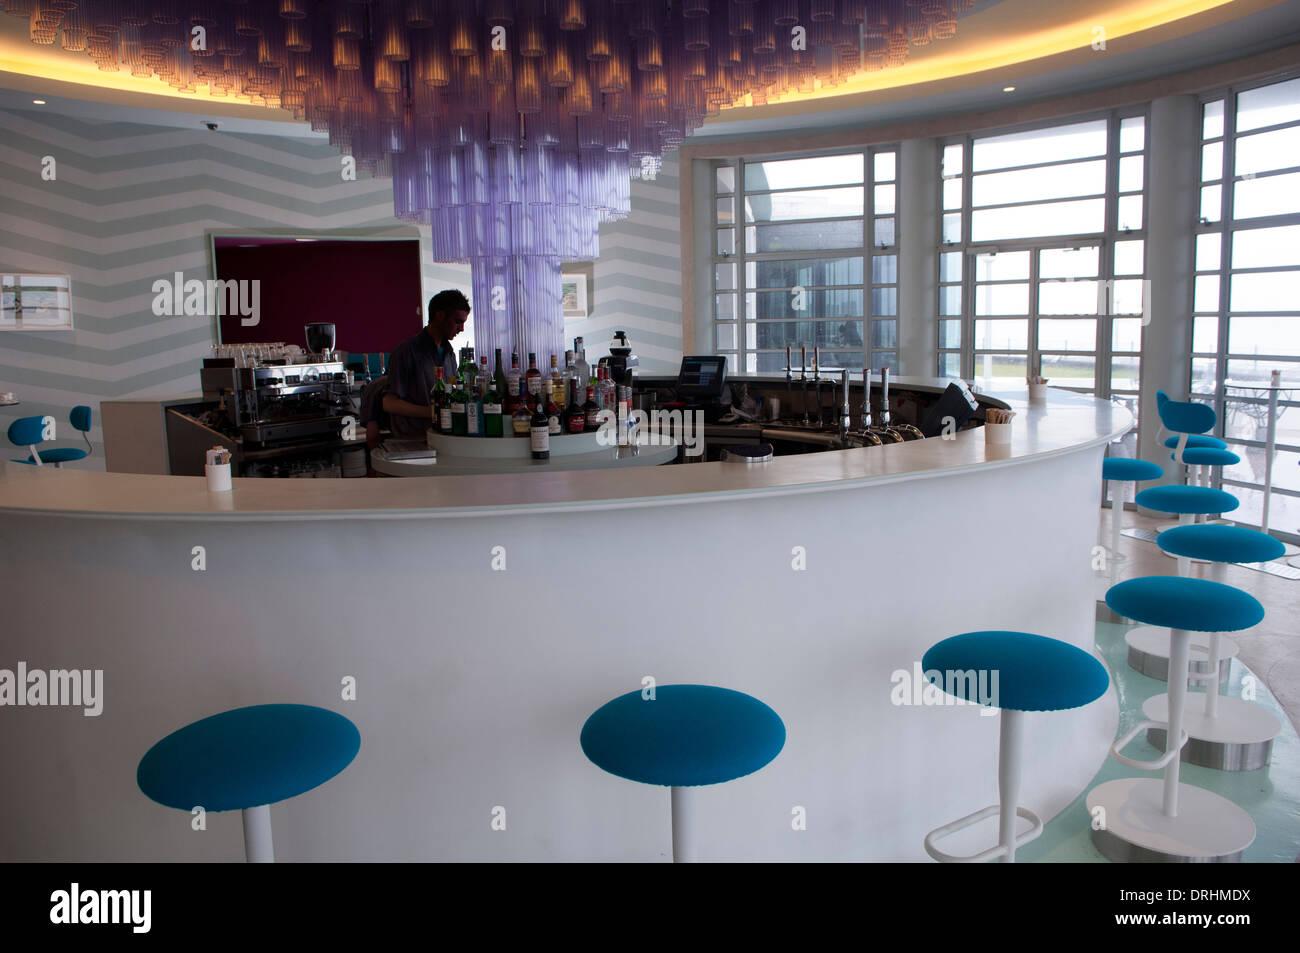 A Bar at The Midland Hotel is a Streamline Modern (Art Deco ...